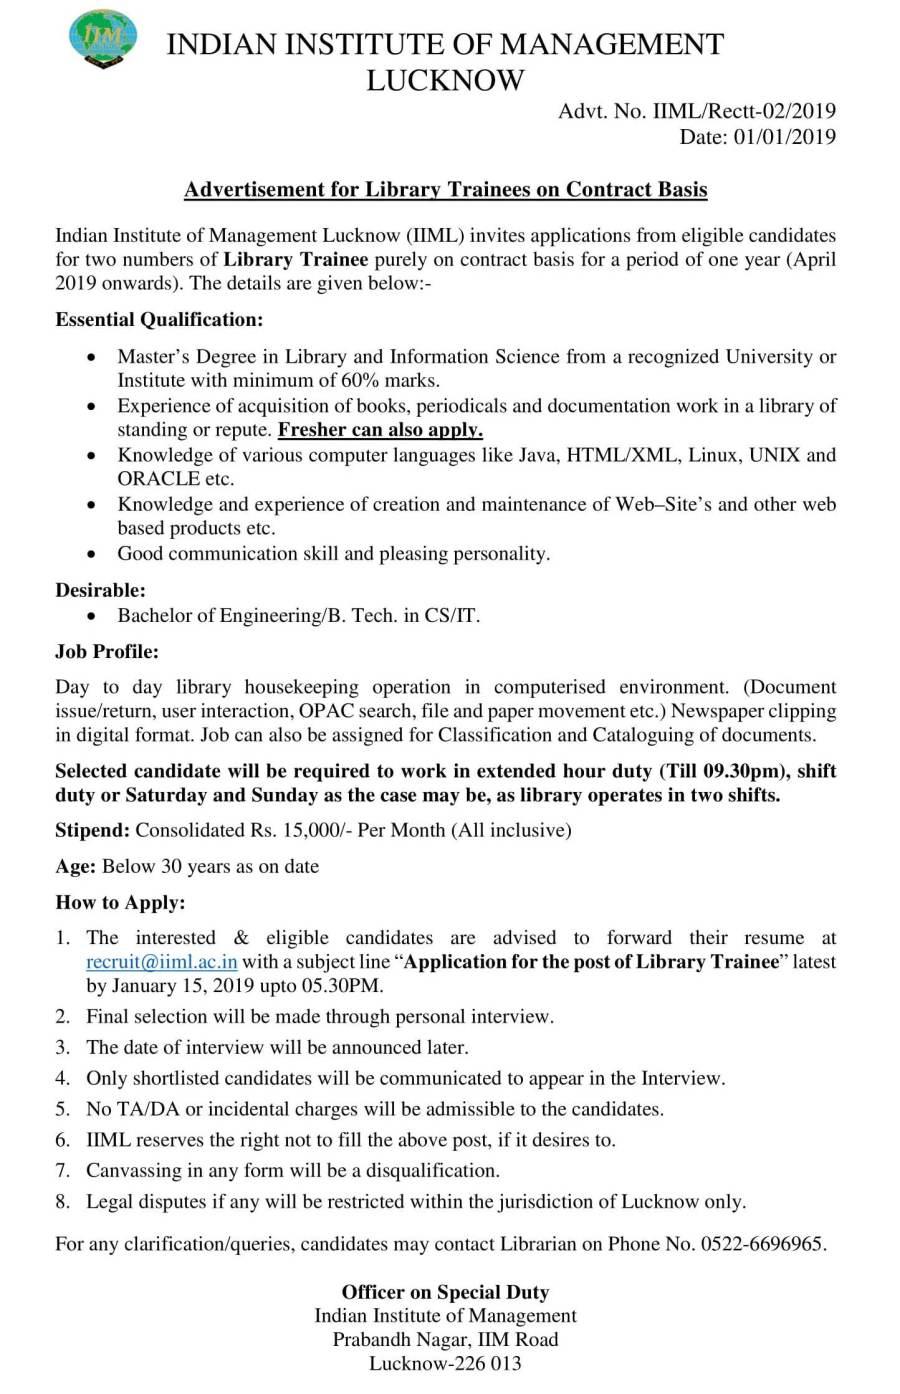 Library-Trainee-Advt-02-01-2019-1.jpg